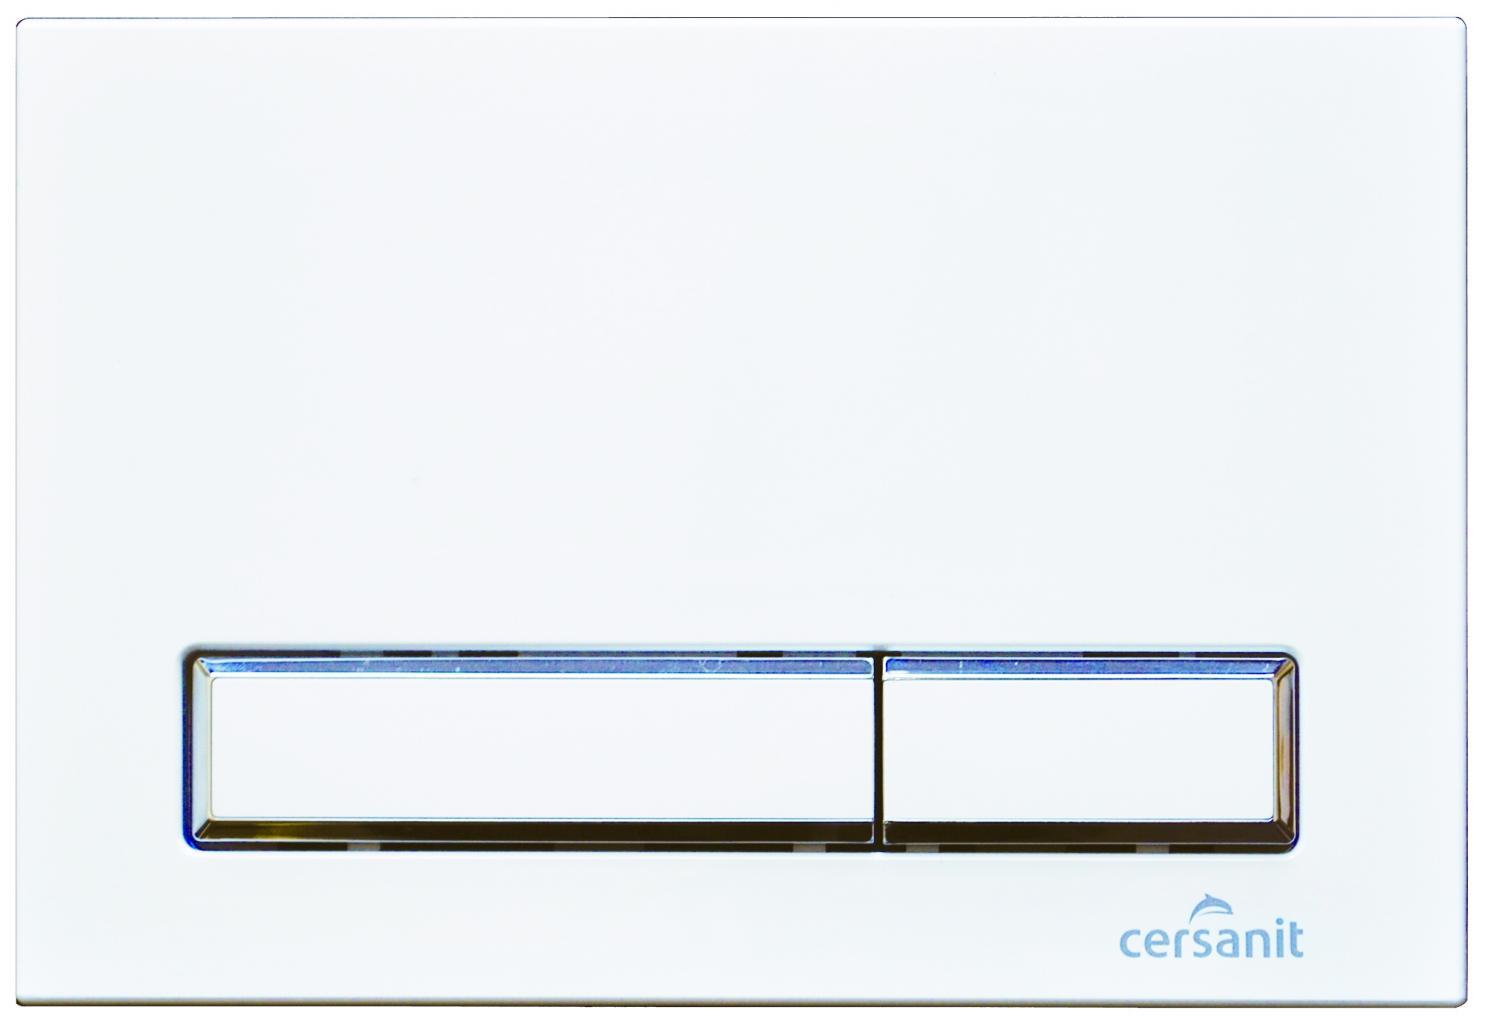 CERSANIT - TLAČIDLO K systémom HI-TEC Blick BIELE (K97-256)